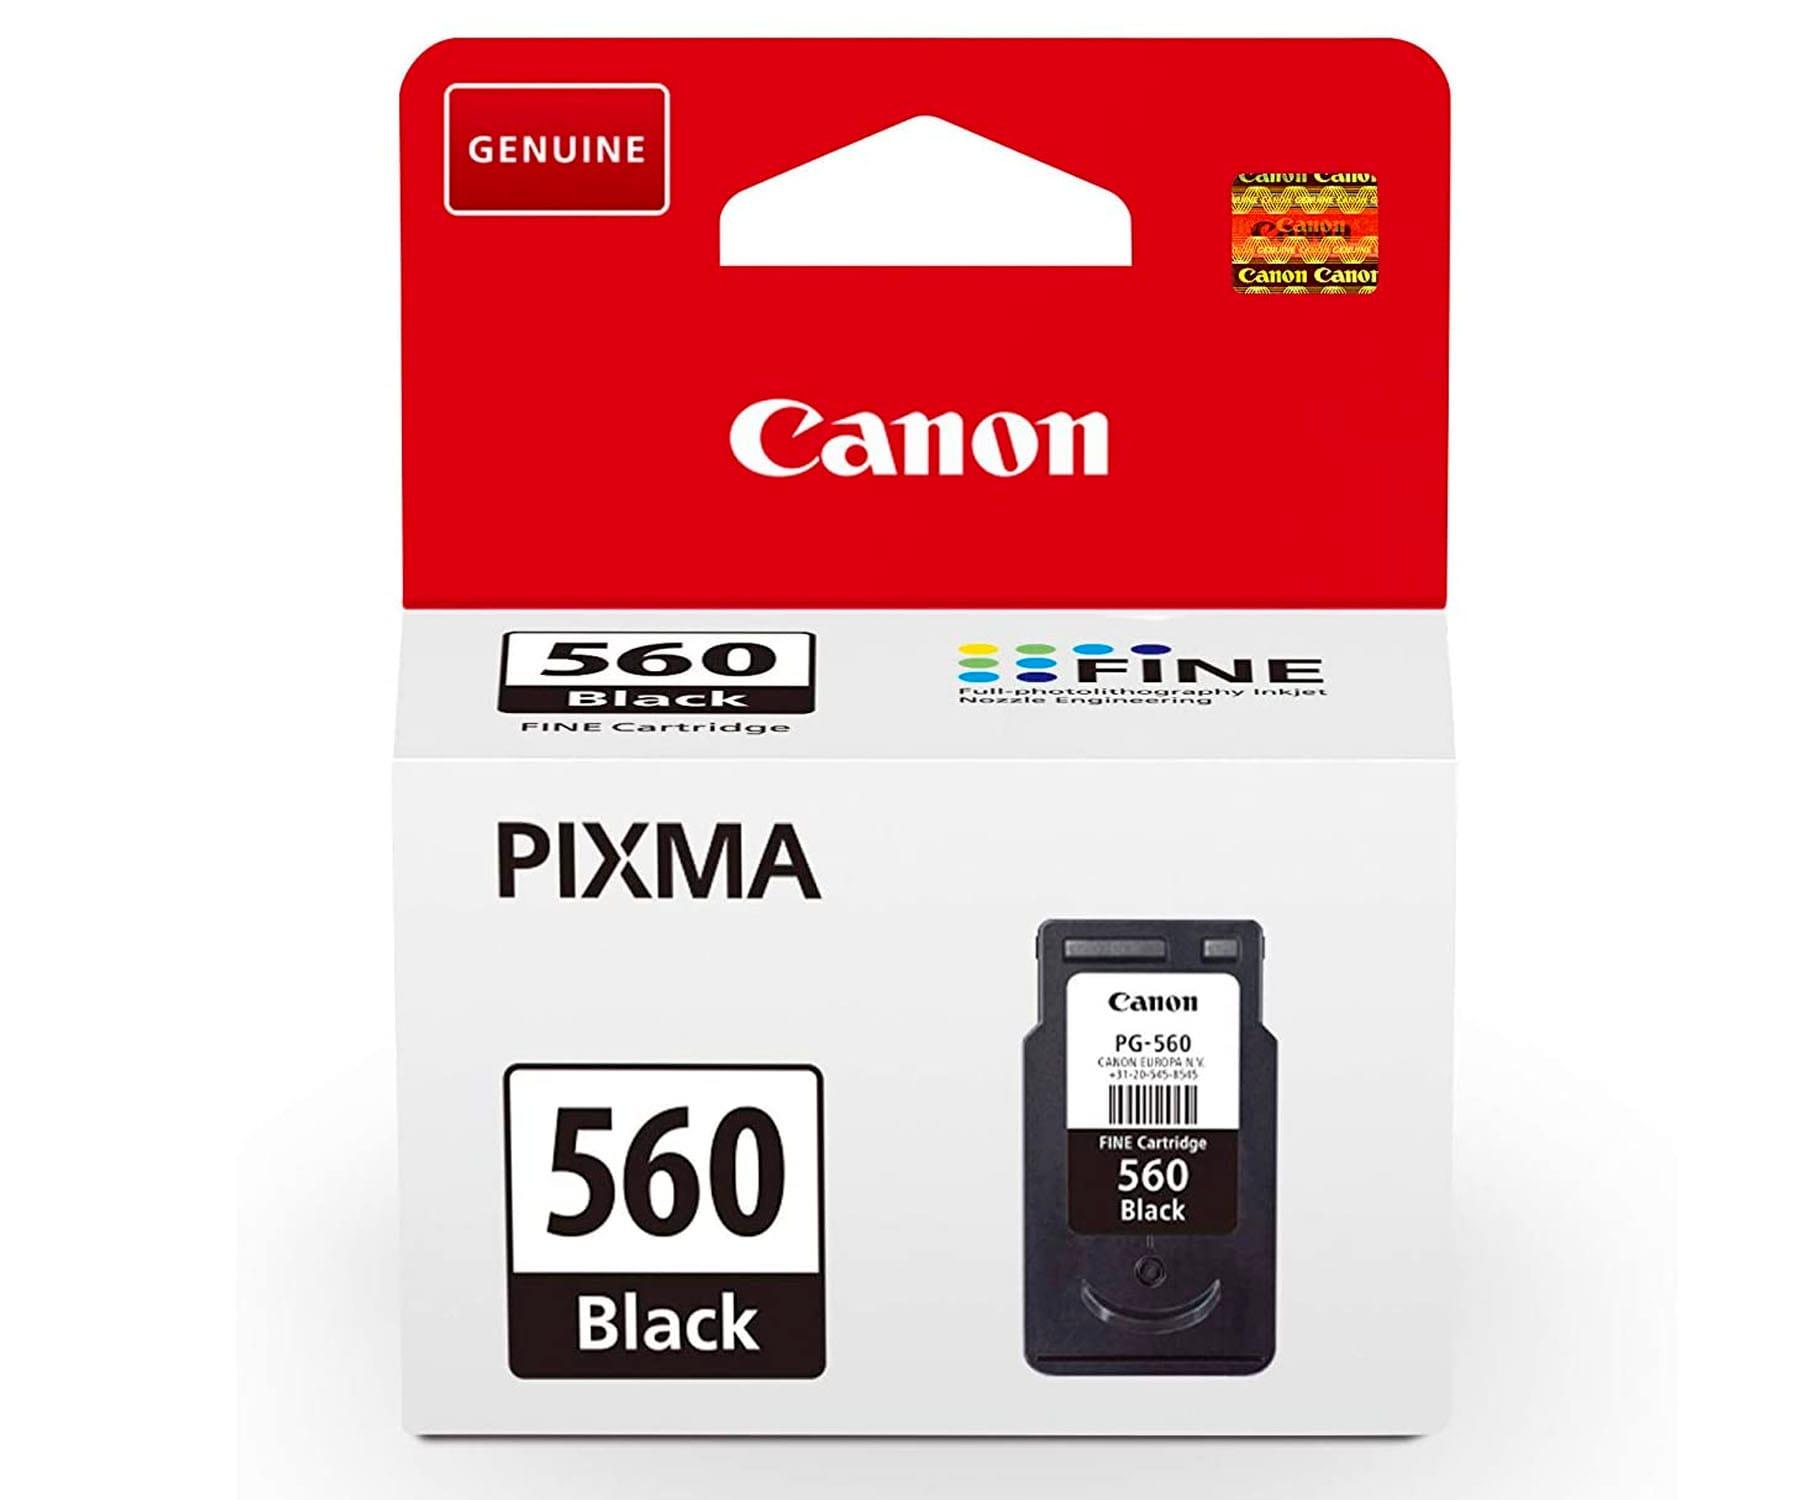 CANON PG-560 COLOR NEGRO CARTUCHO DE TINTA 8ML FINE PIXMA